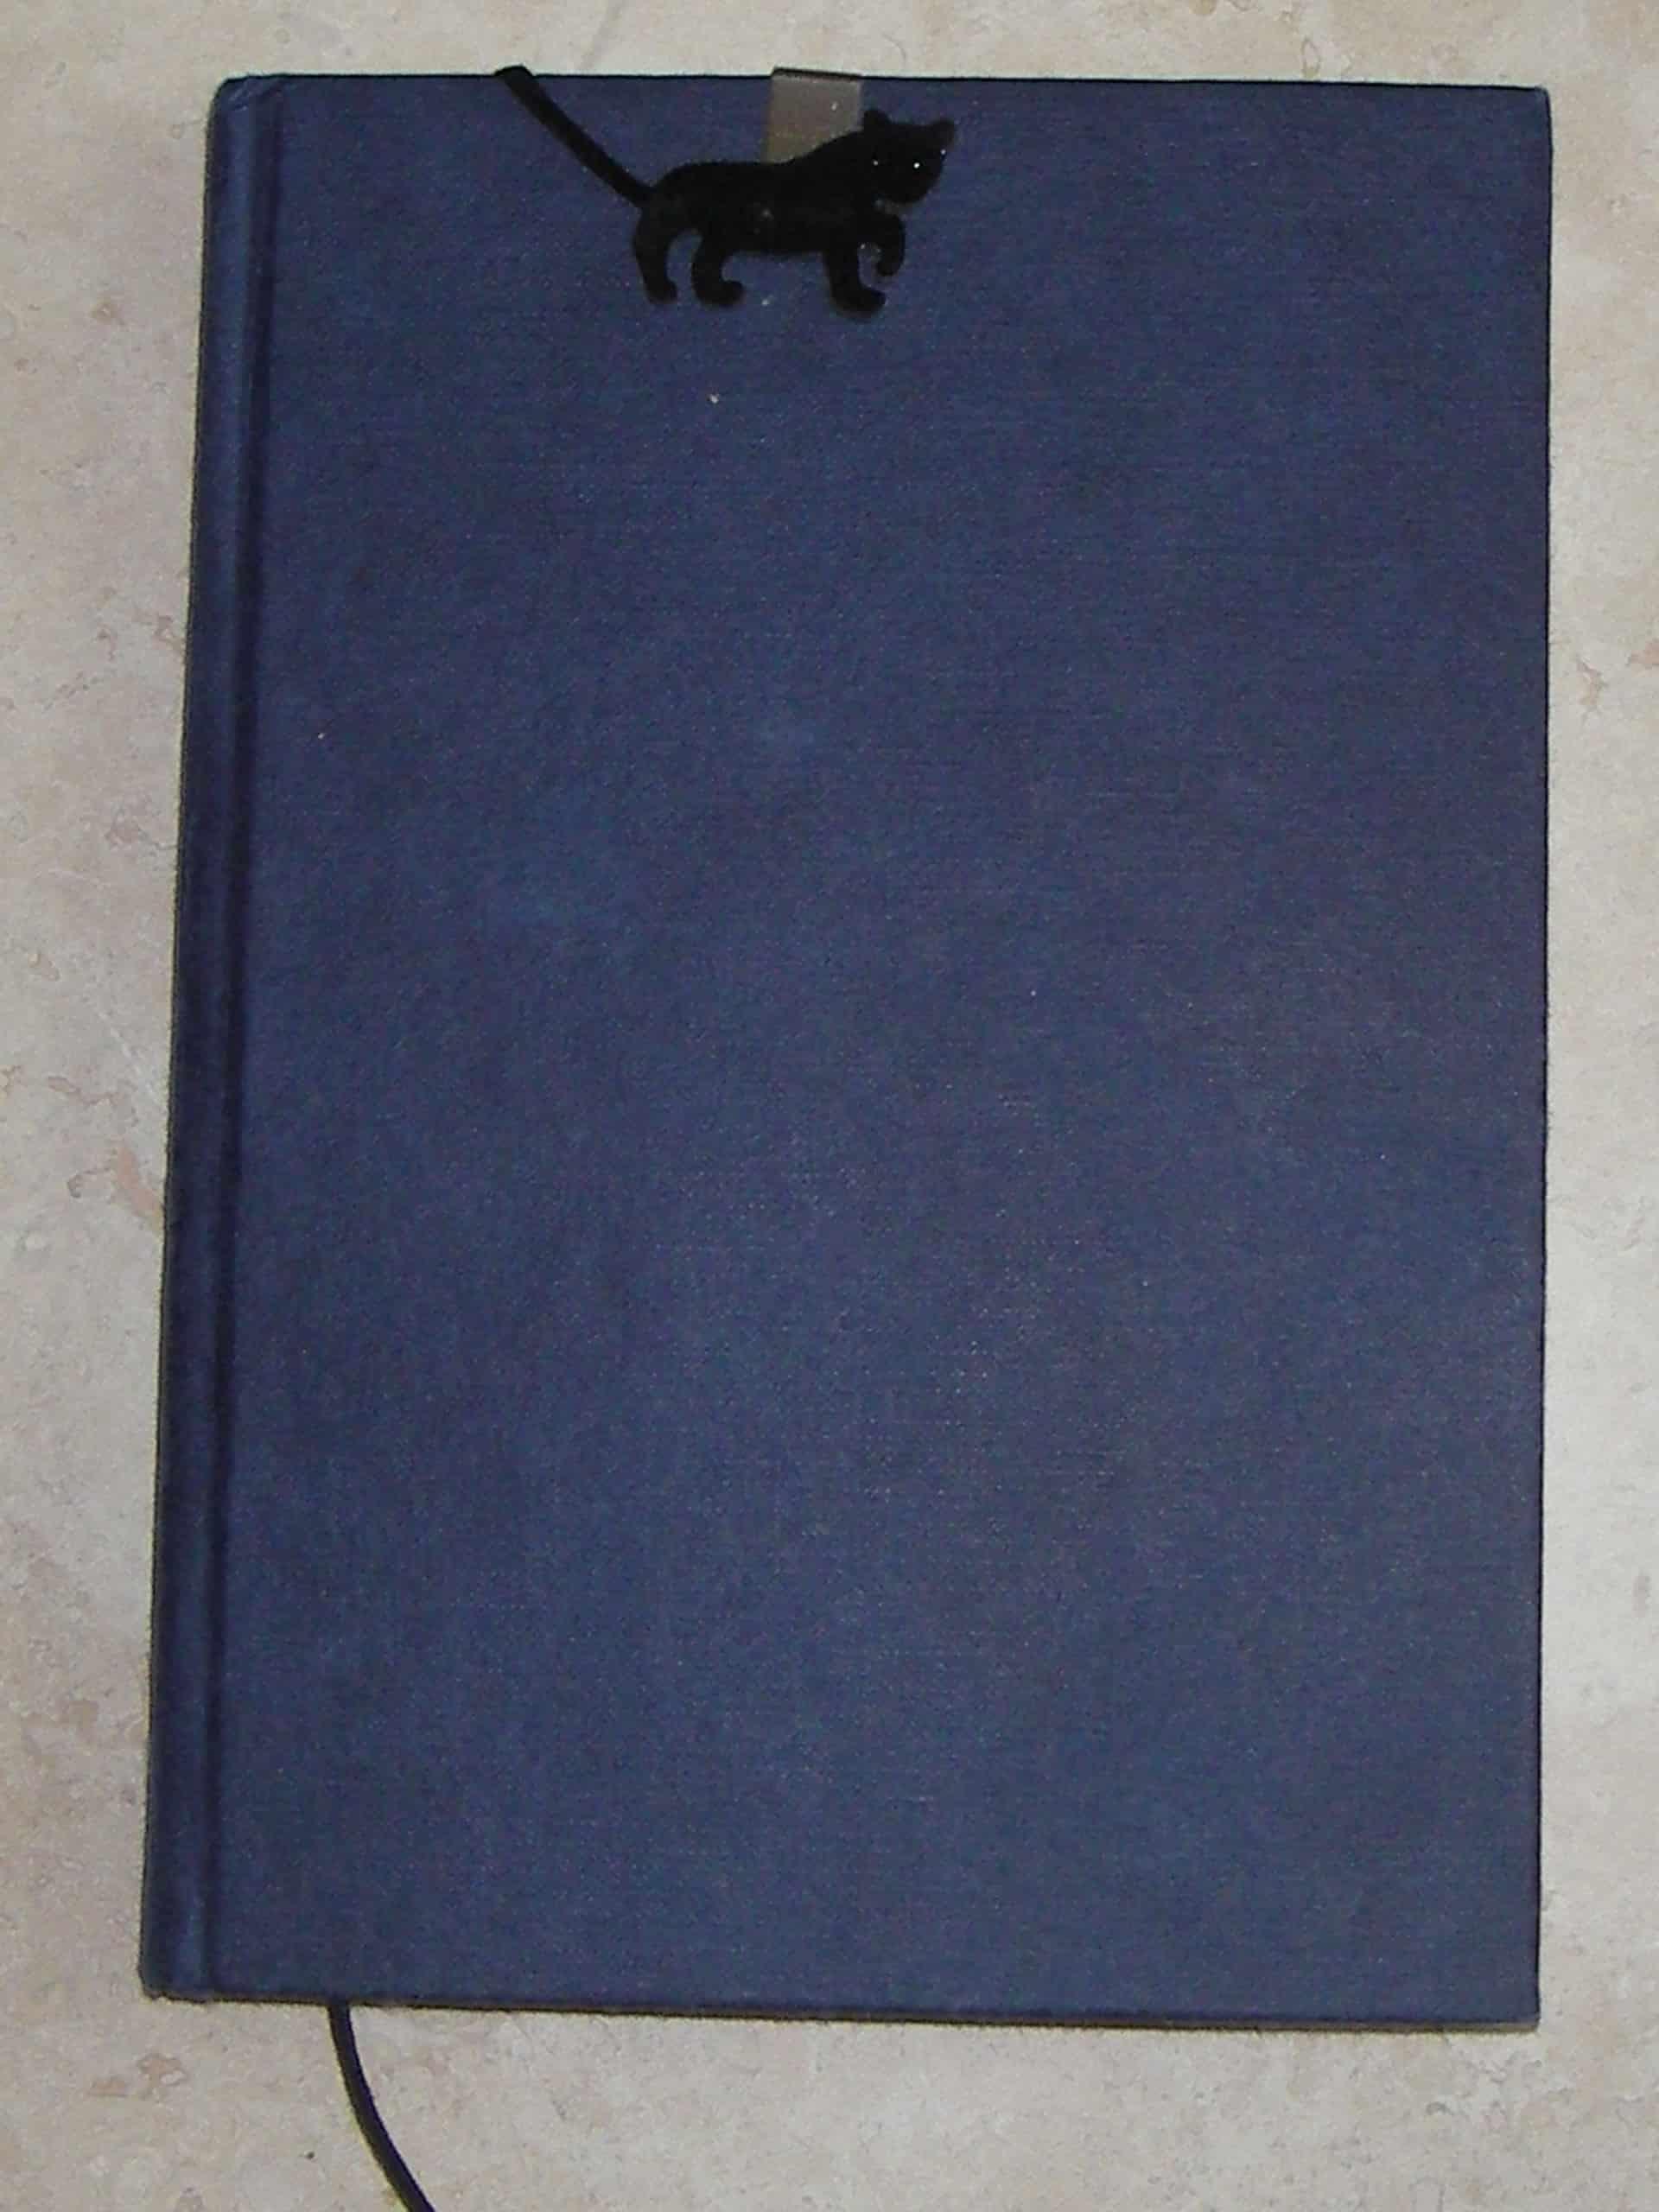 a blue hardback notebook